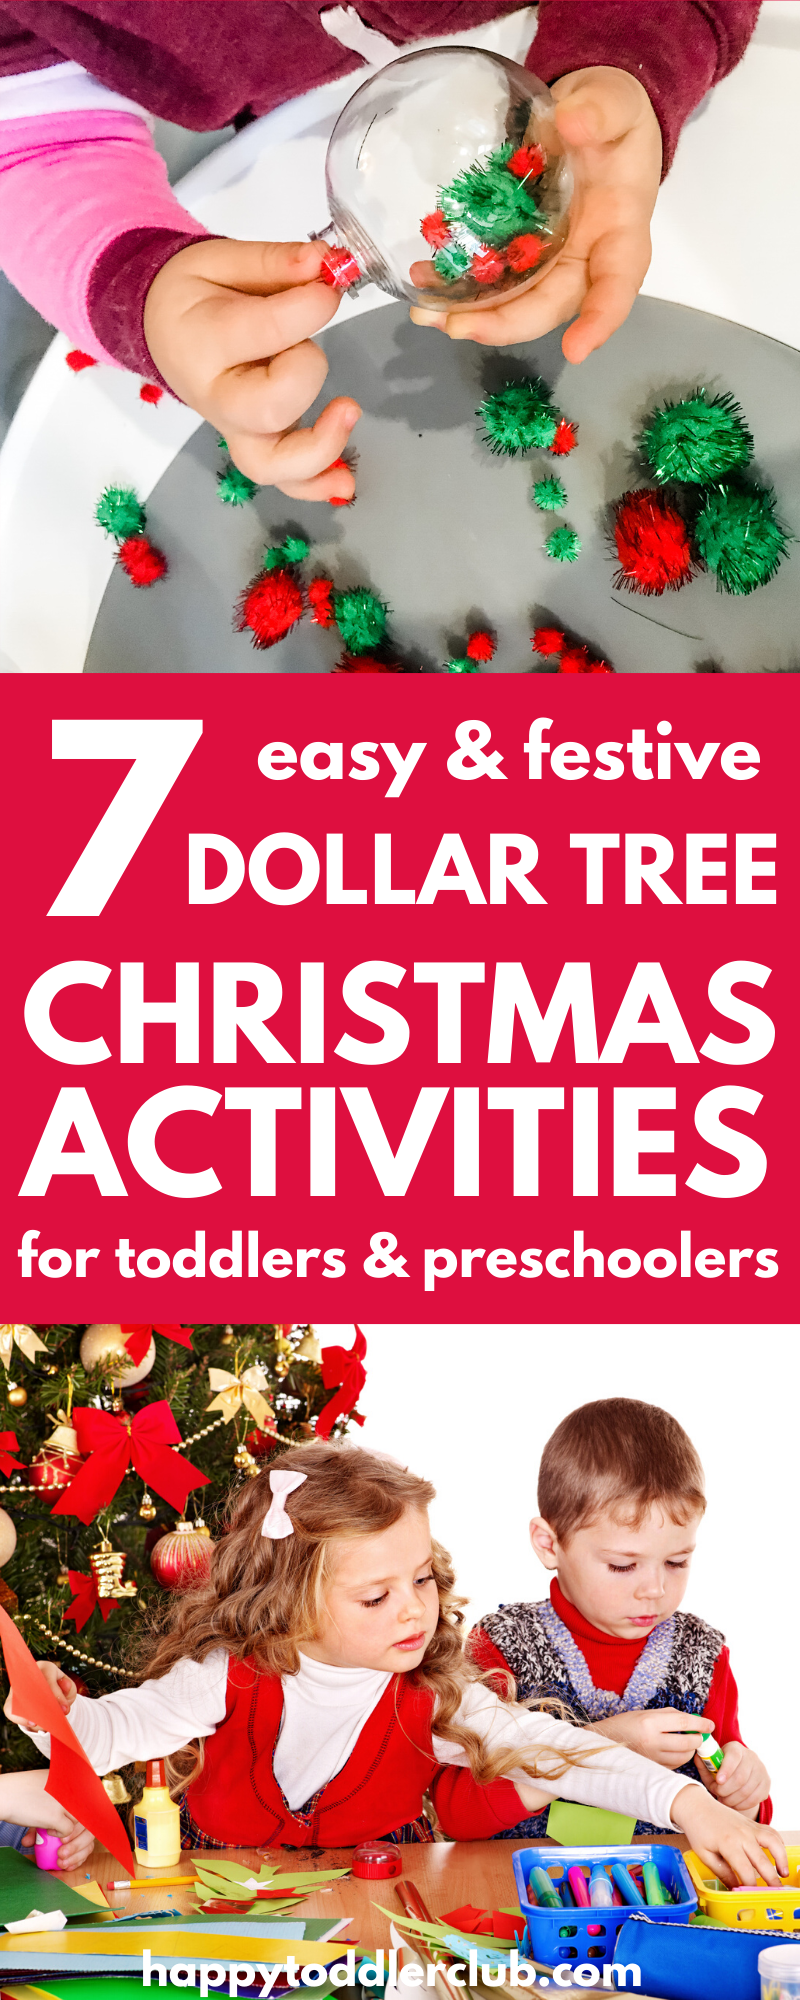 7 Easy Dollar Tree Christmas Activities for Toddlers & Preschoolers